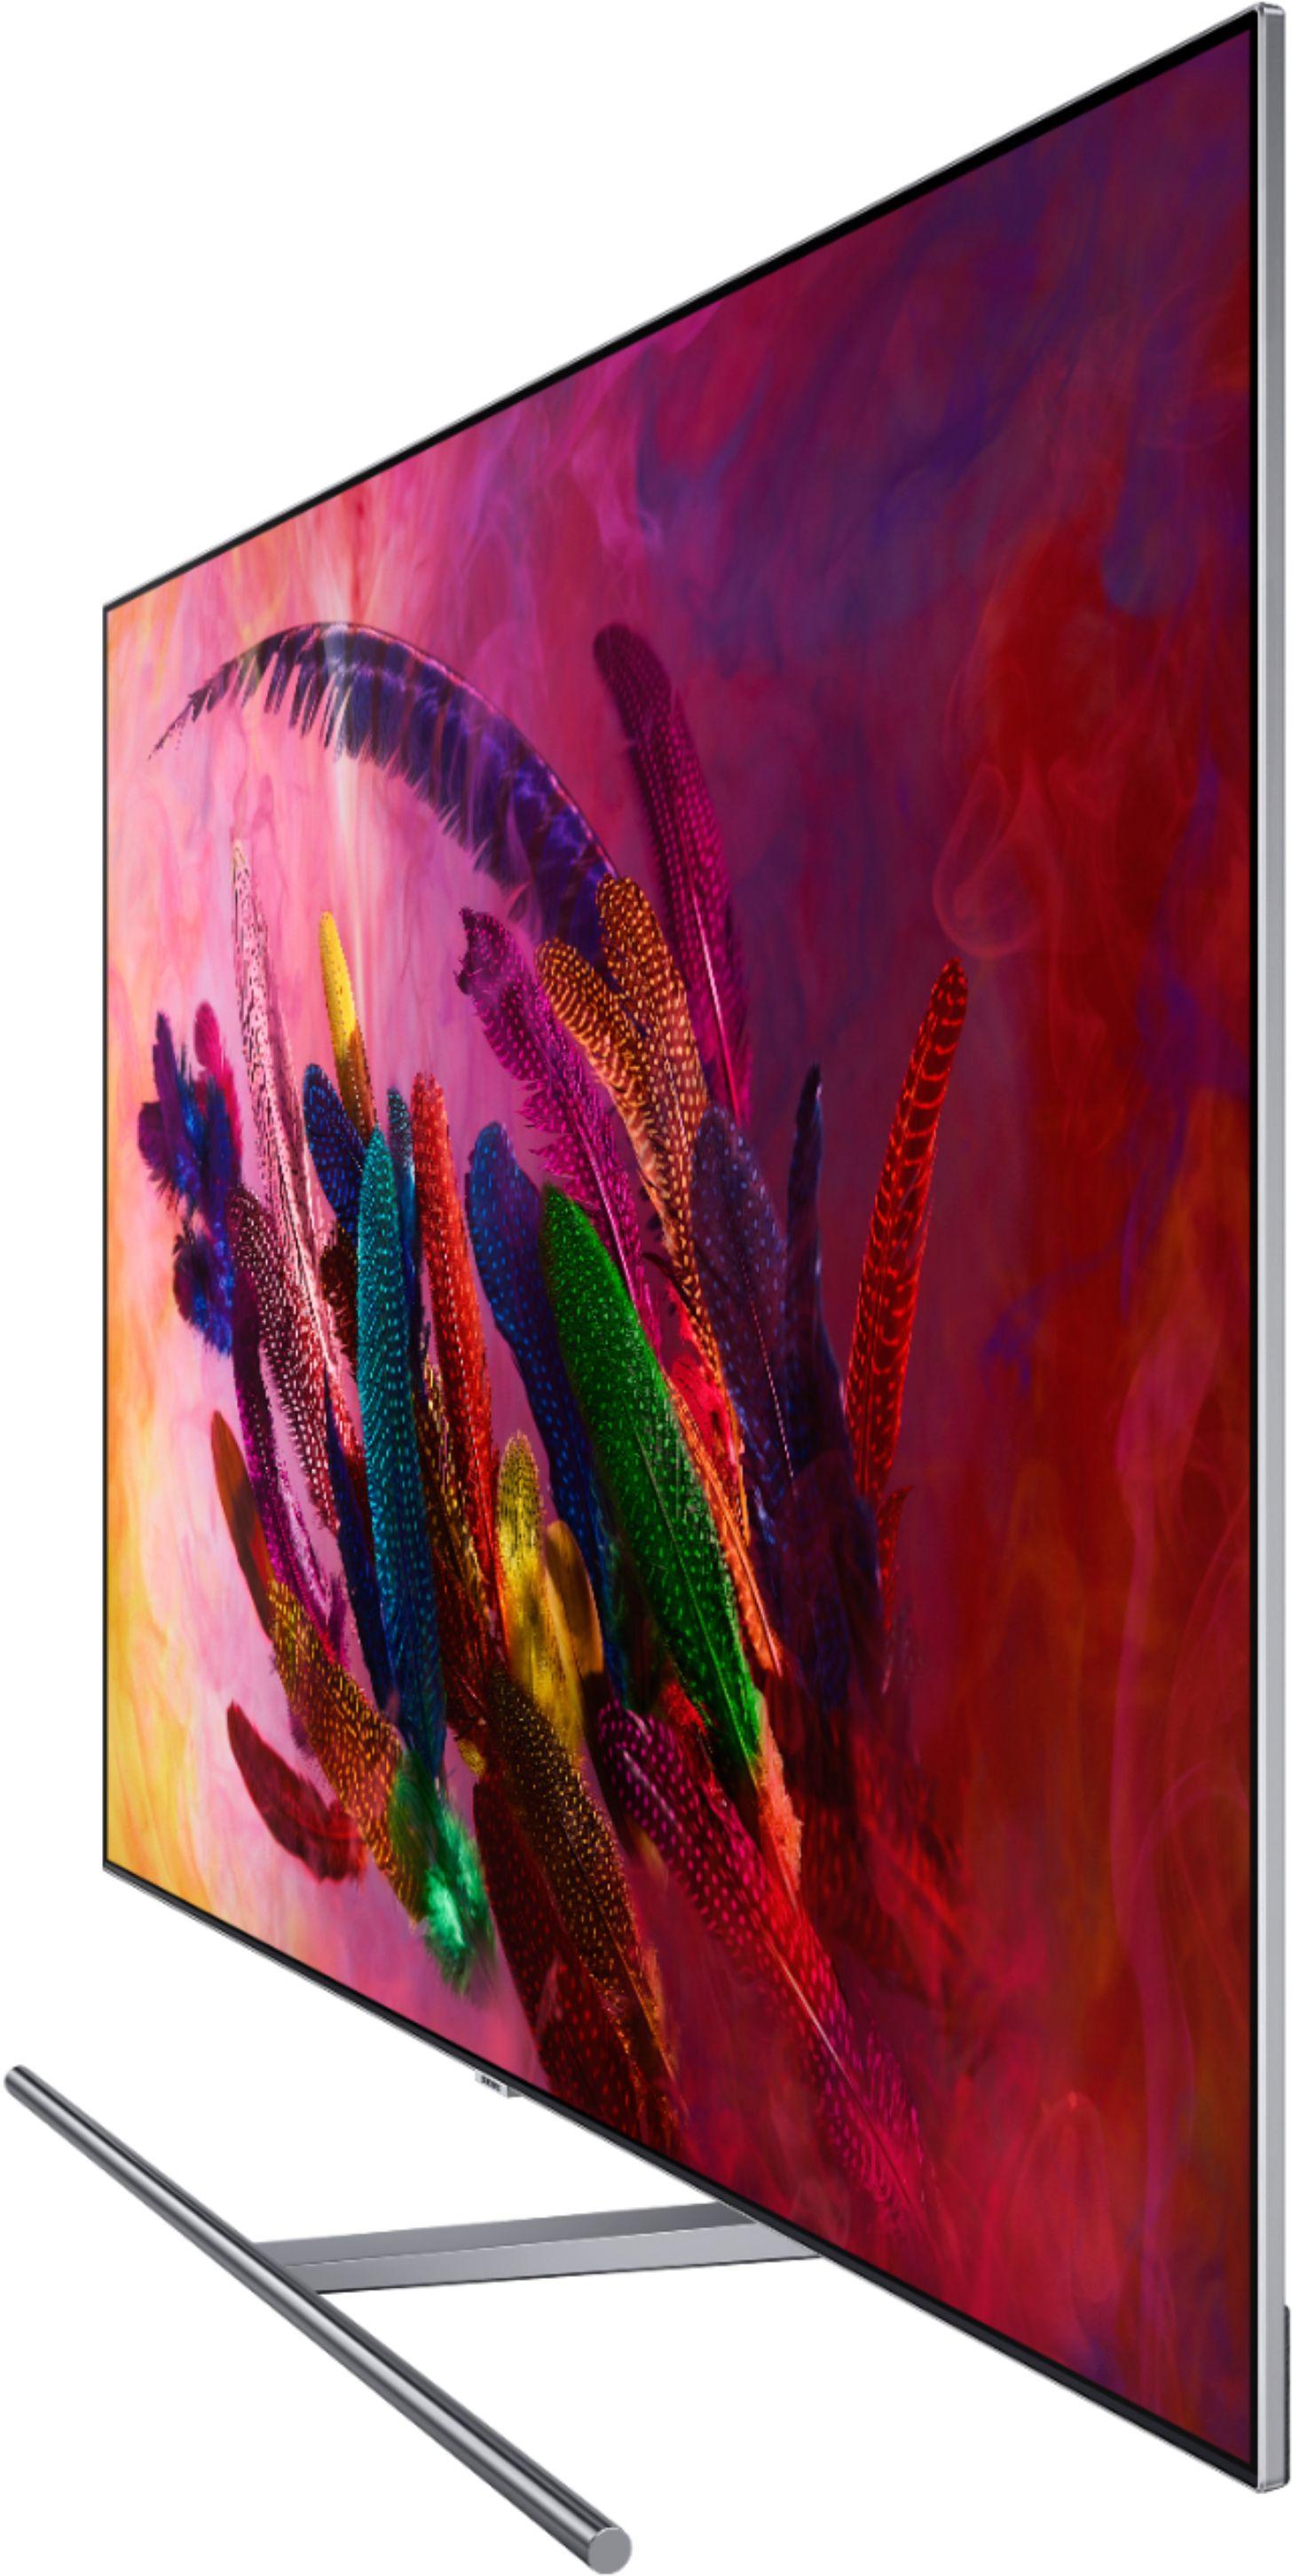 Image 11 for Samsung QN75Q7FNAFXZA